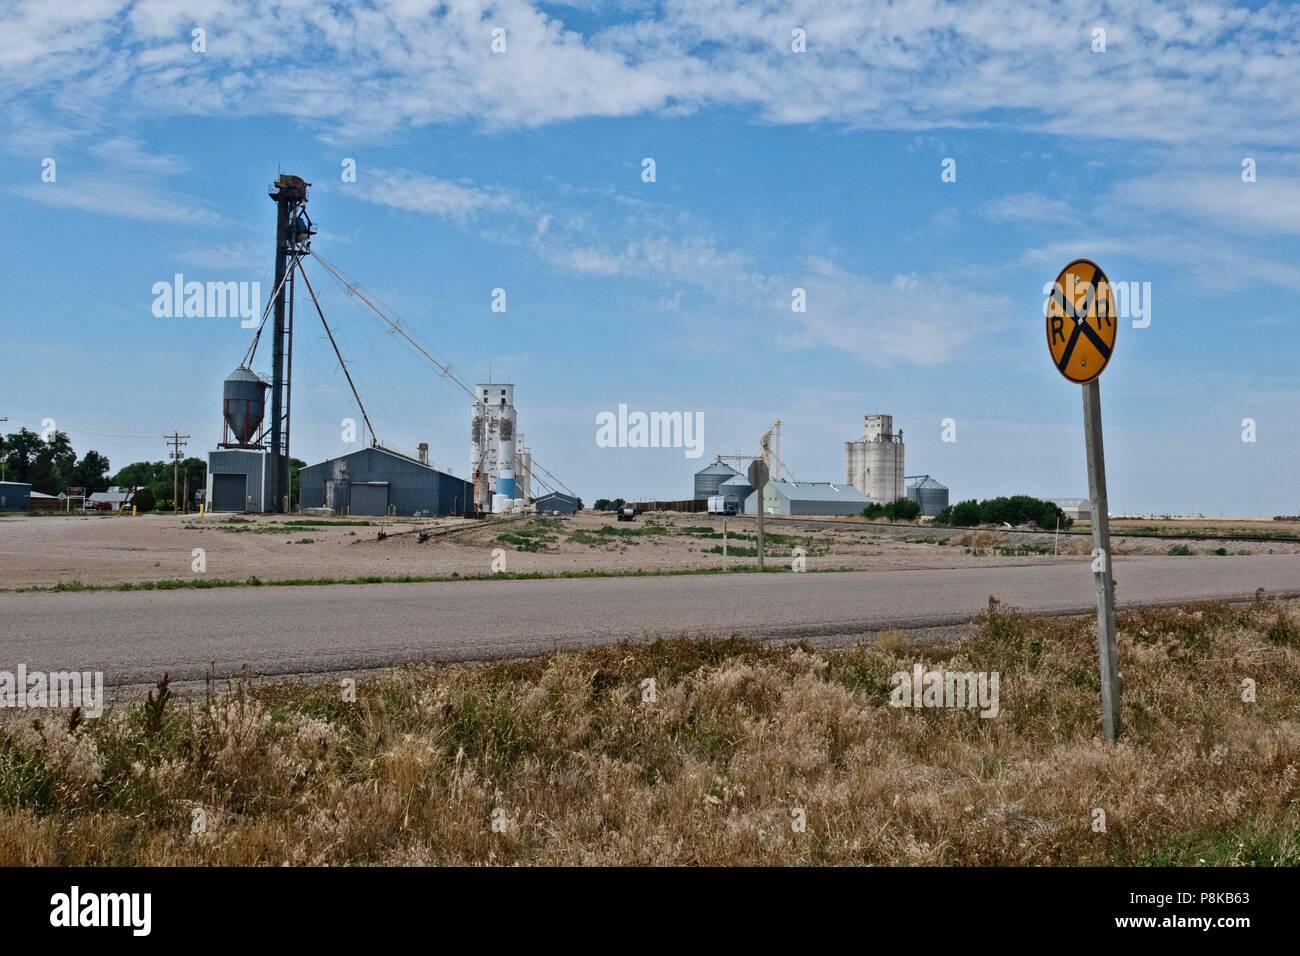 Moscow, Kansas roadside showing grain elevators and grain storage facilities - Stock Image